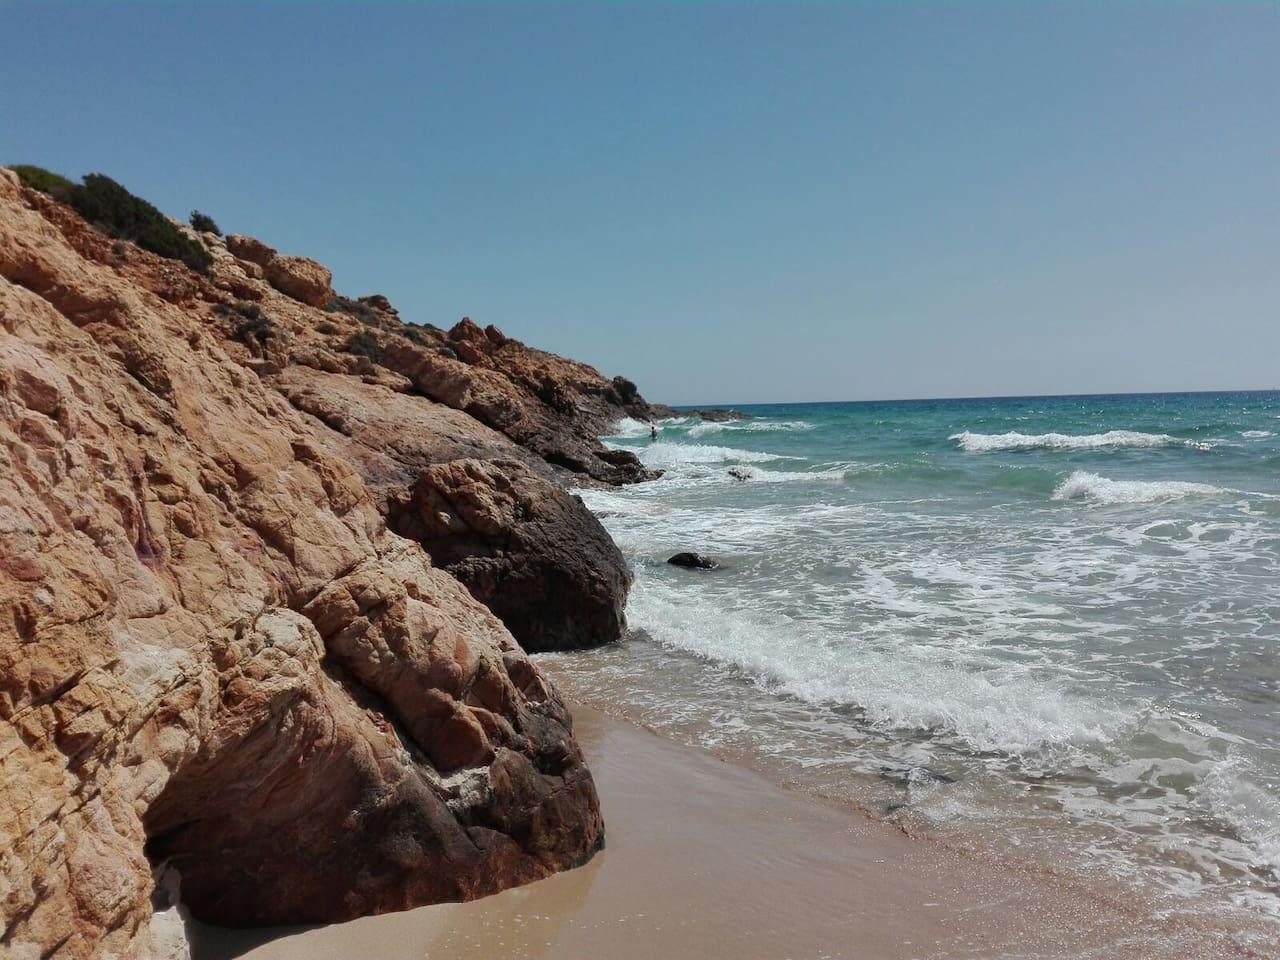 Pinus Village Beach - 20m from home